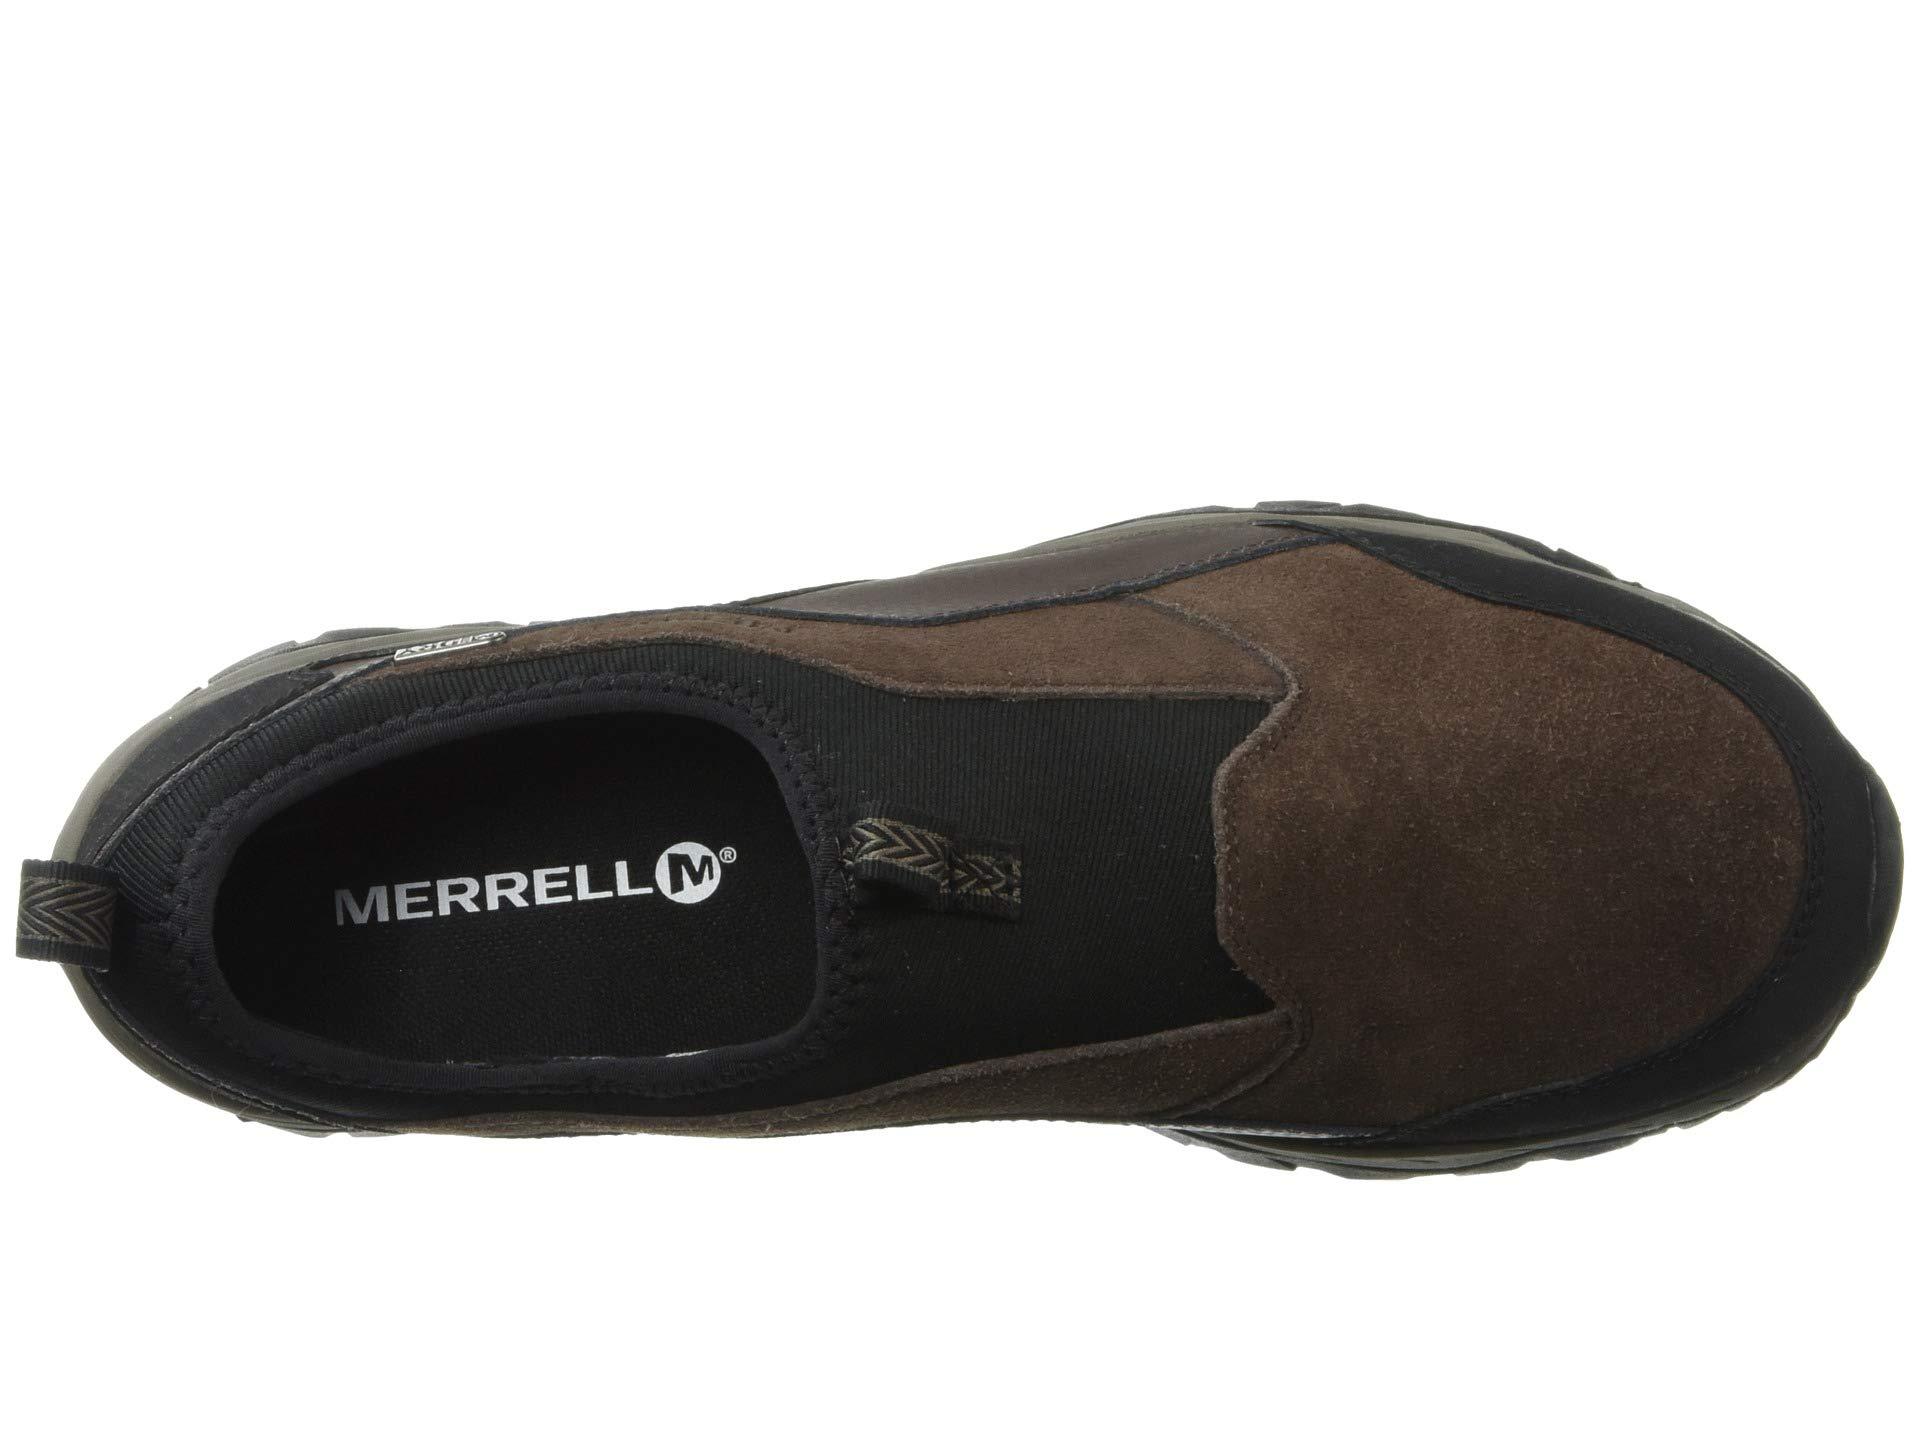 Waterproof Merrell Moc Espresso Icepack Polar tw0Aw4rq